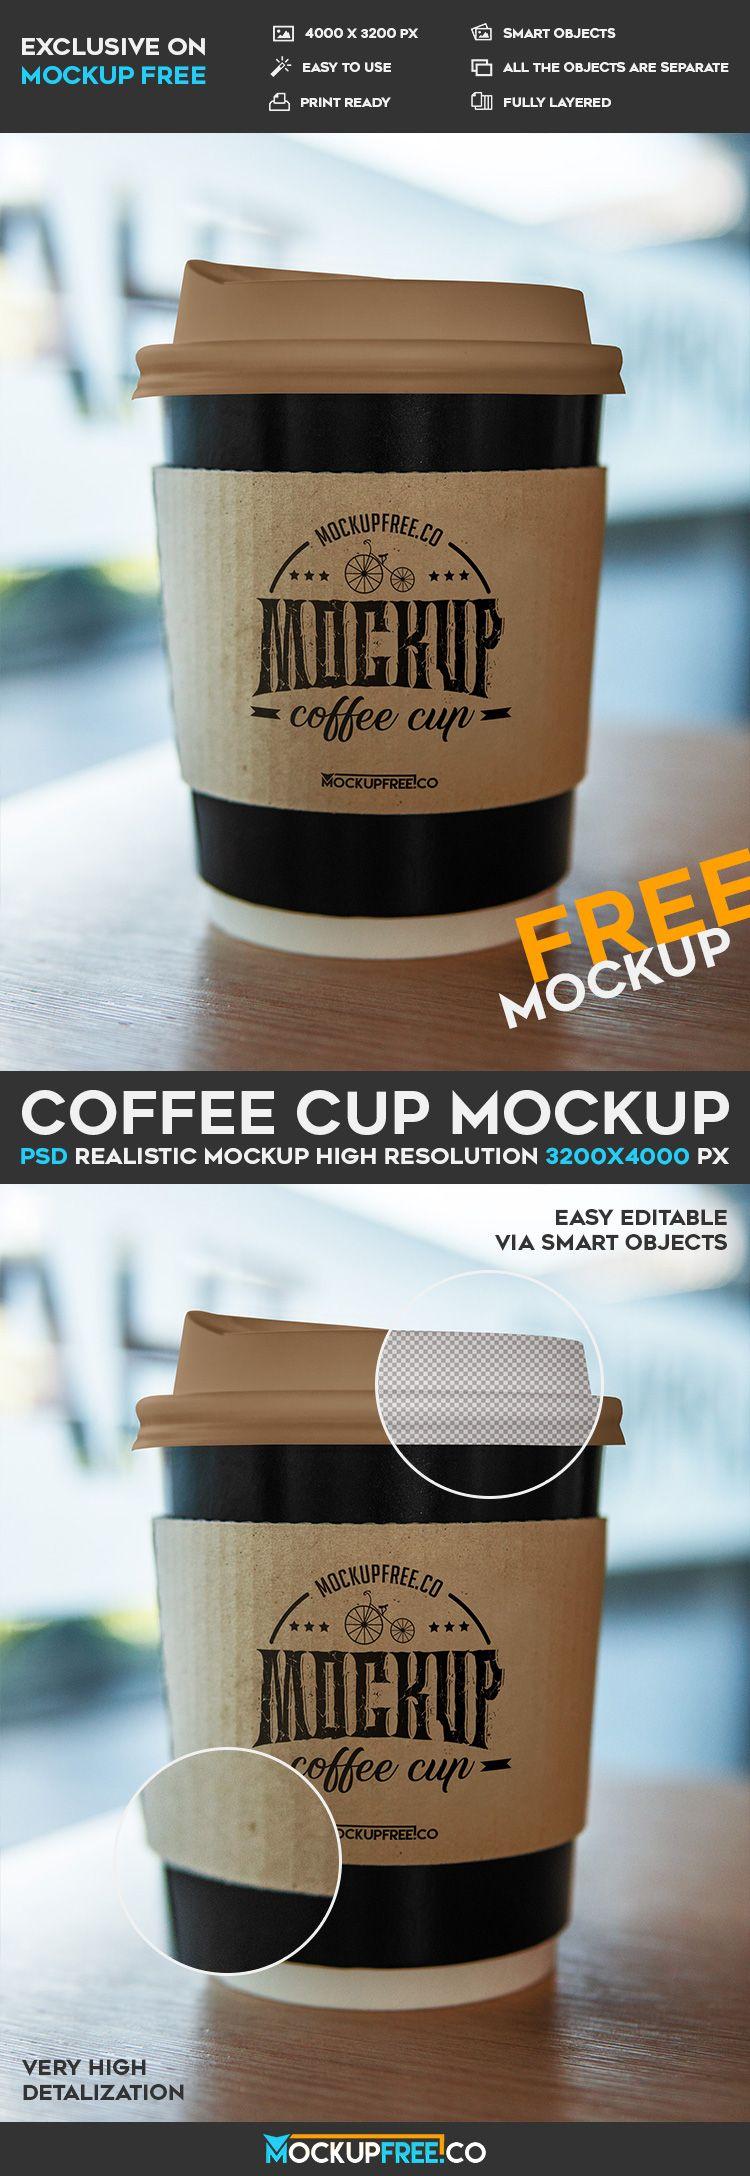 Coffee Cup Free PSD Mockup Download Mockup, Coffee cups